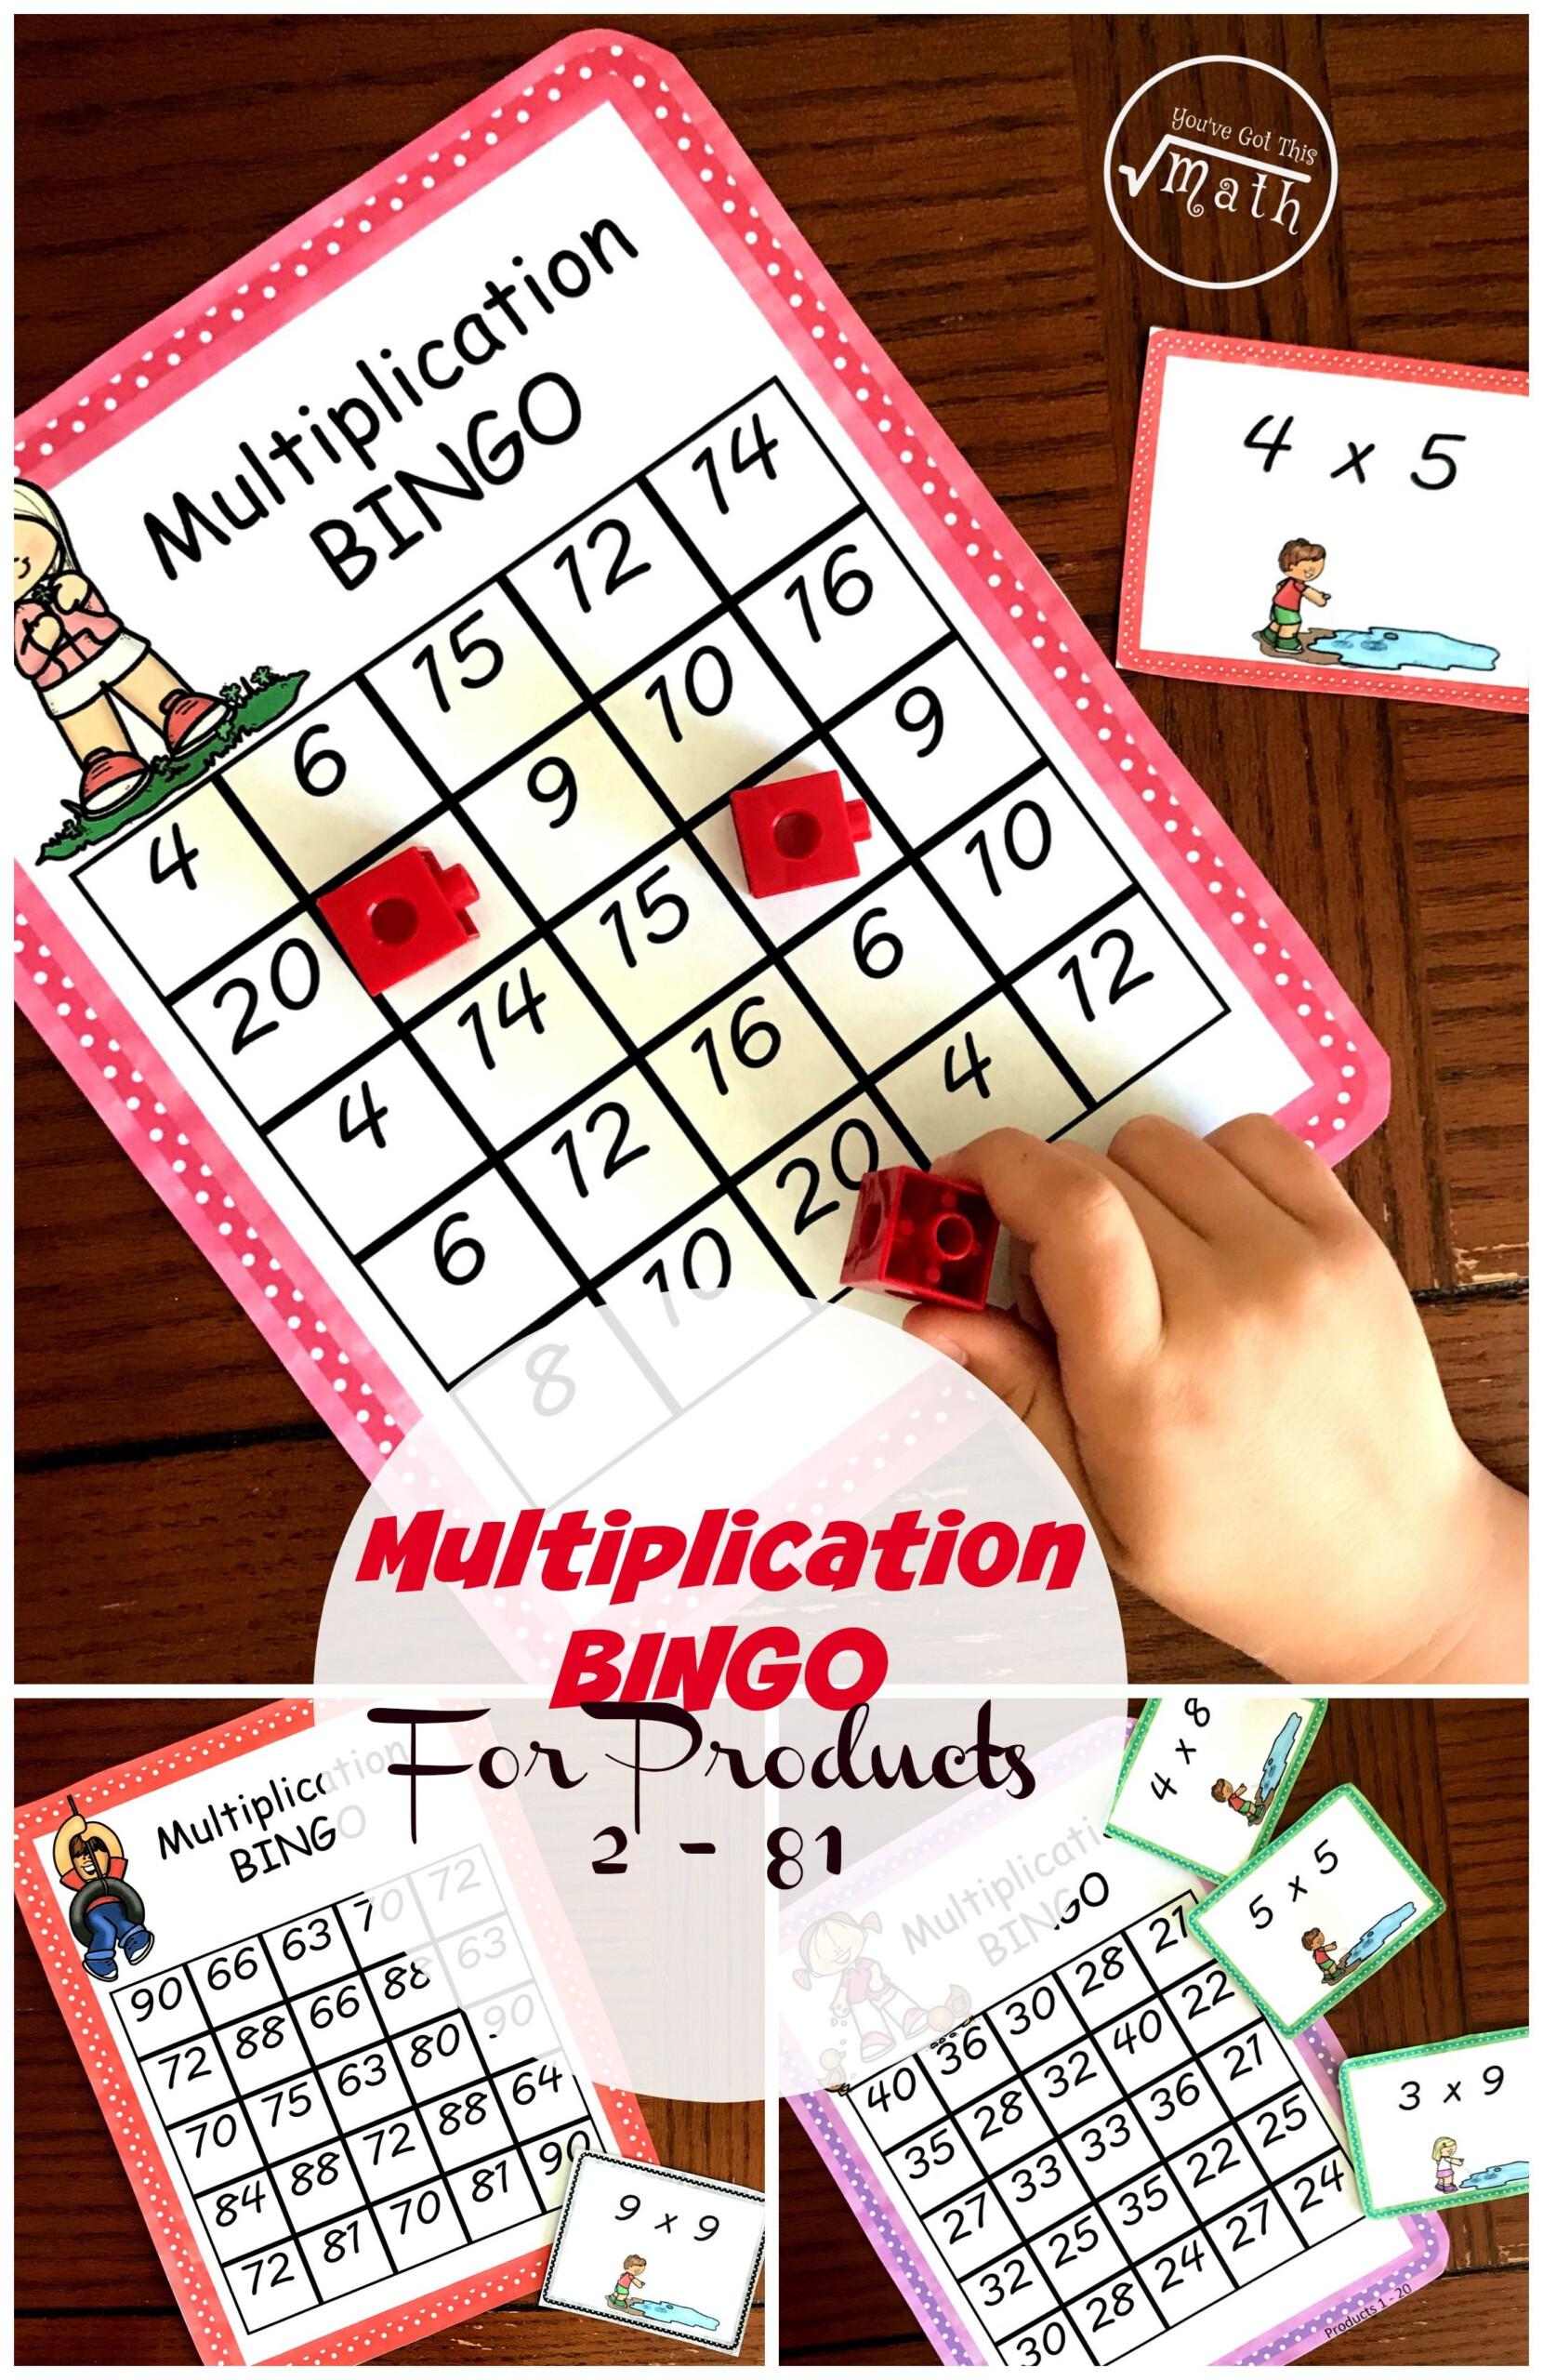 Multiplication Bingo - A Fun Game To Practice Multiplication intended for Printable Multiplication Bingo Game